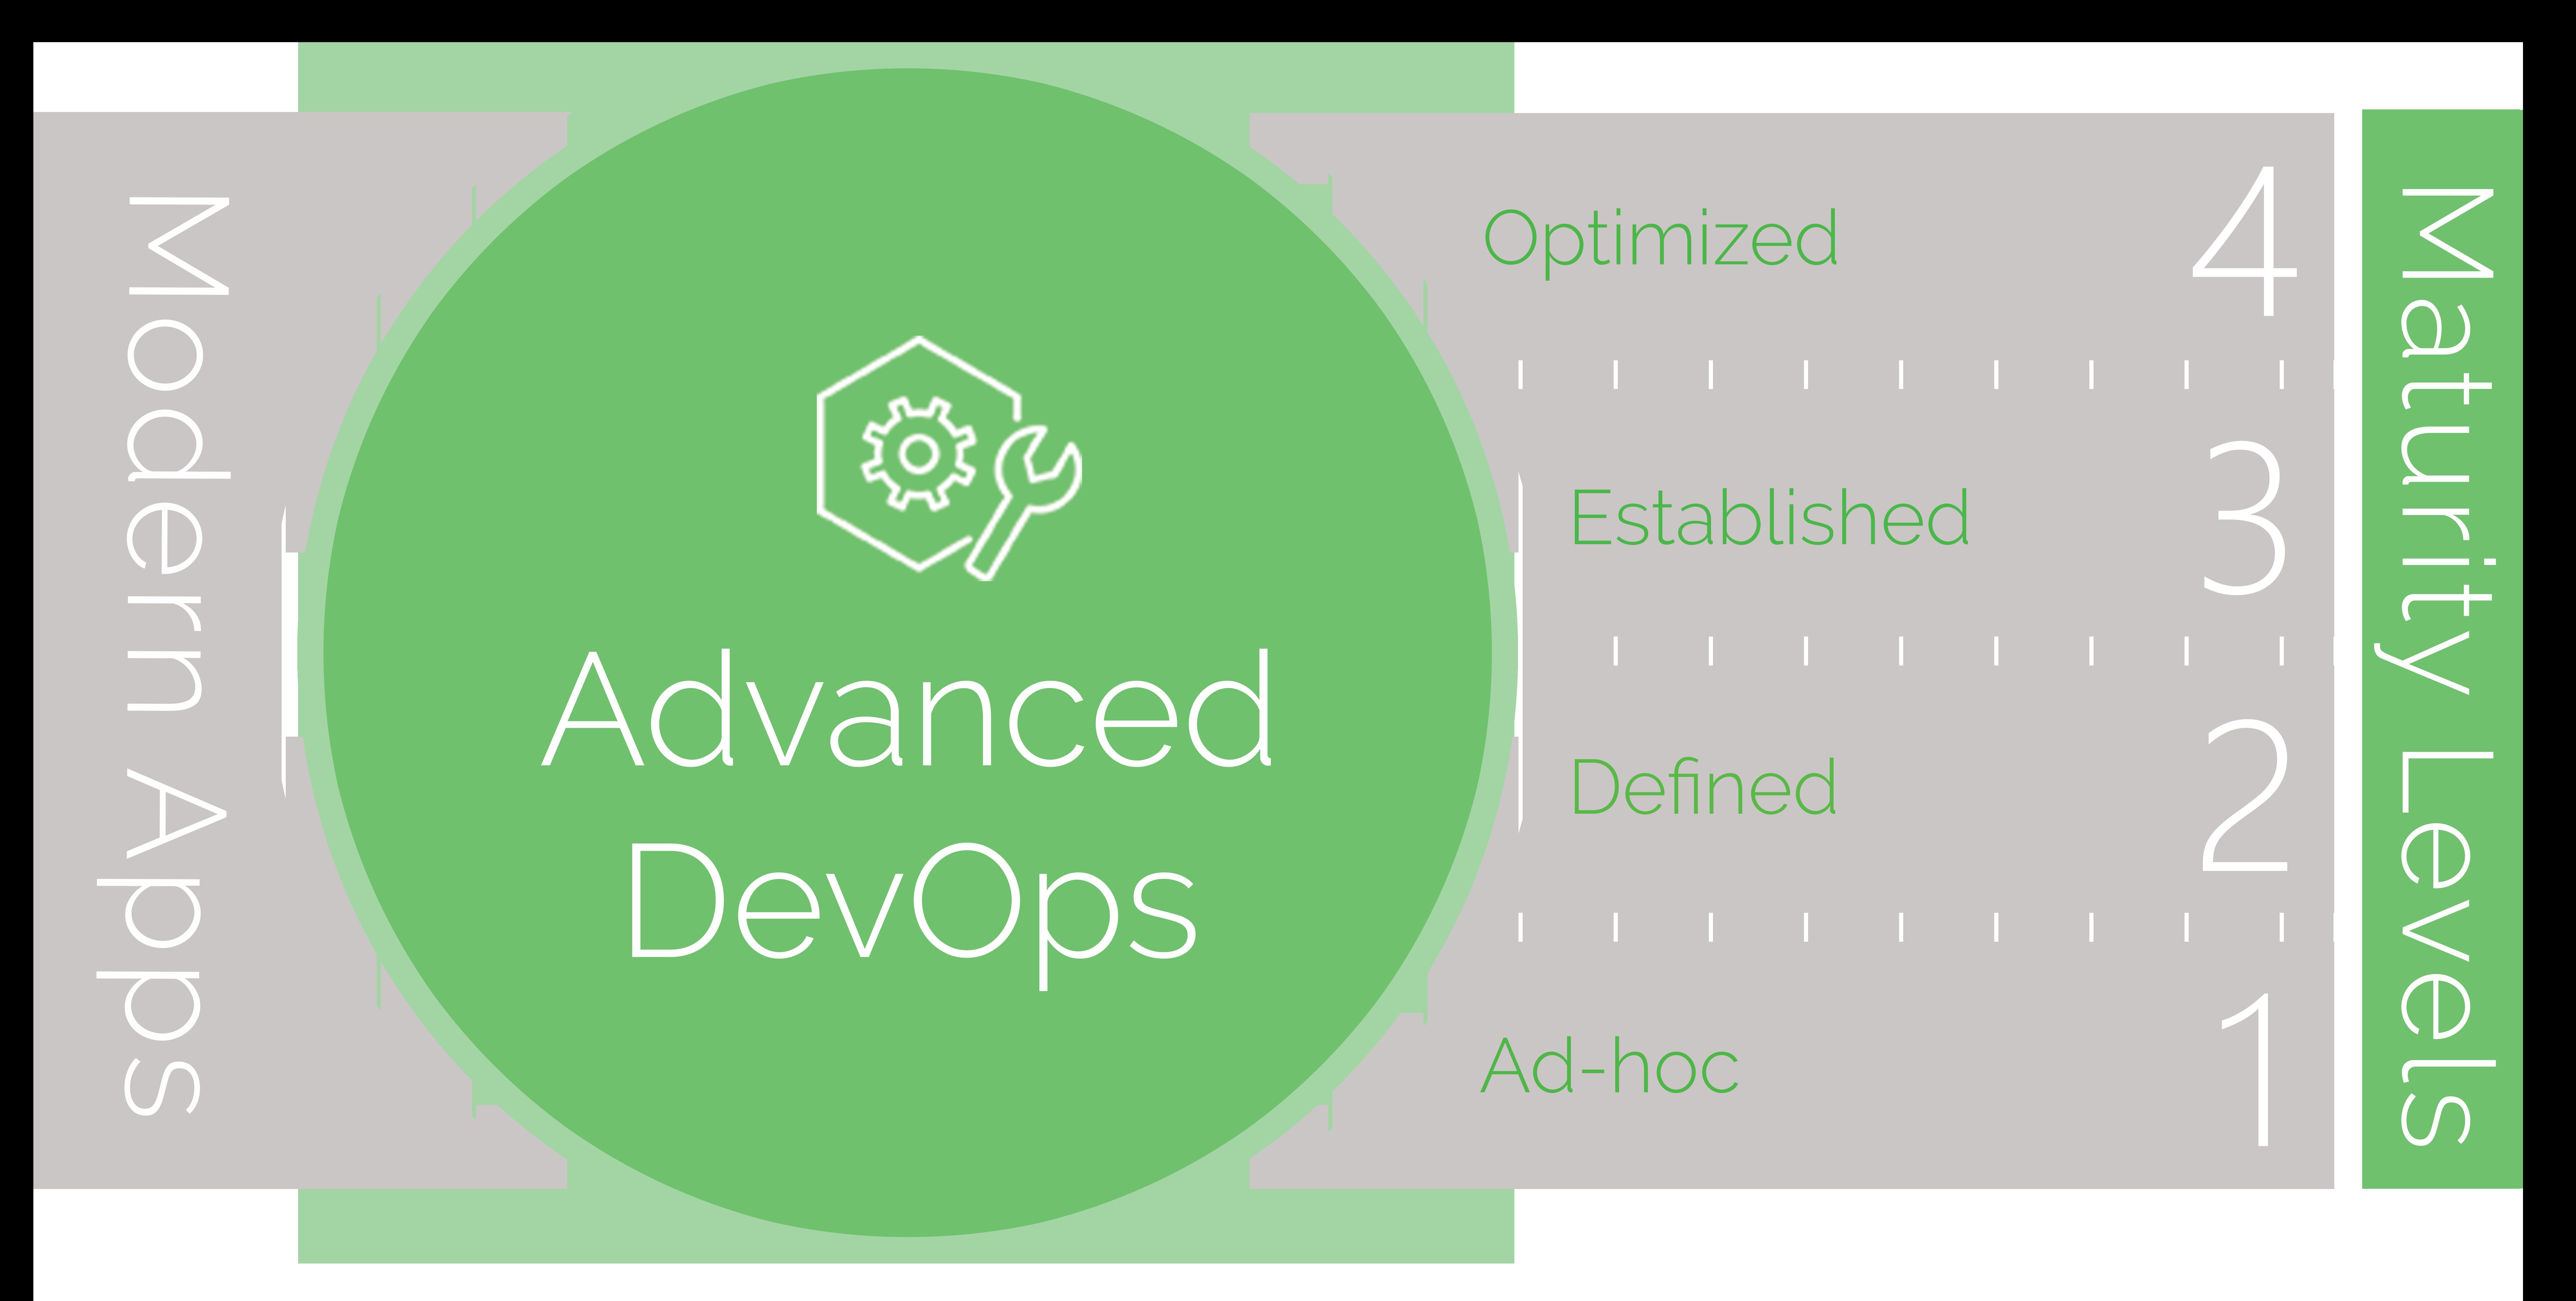 advanced DevOps maturity model.png